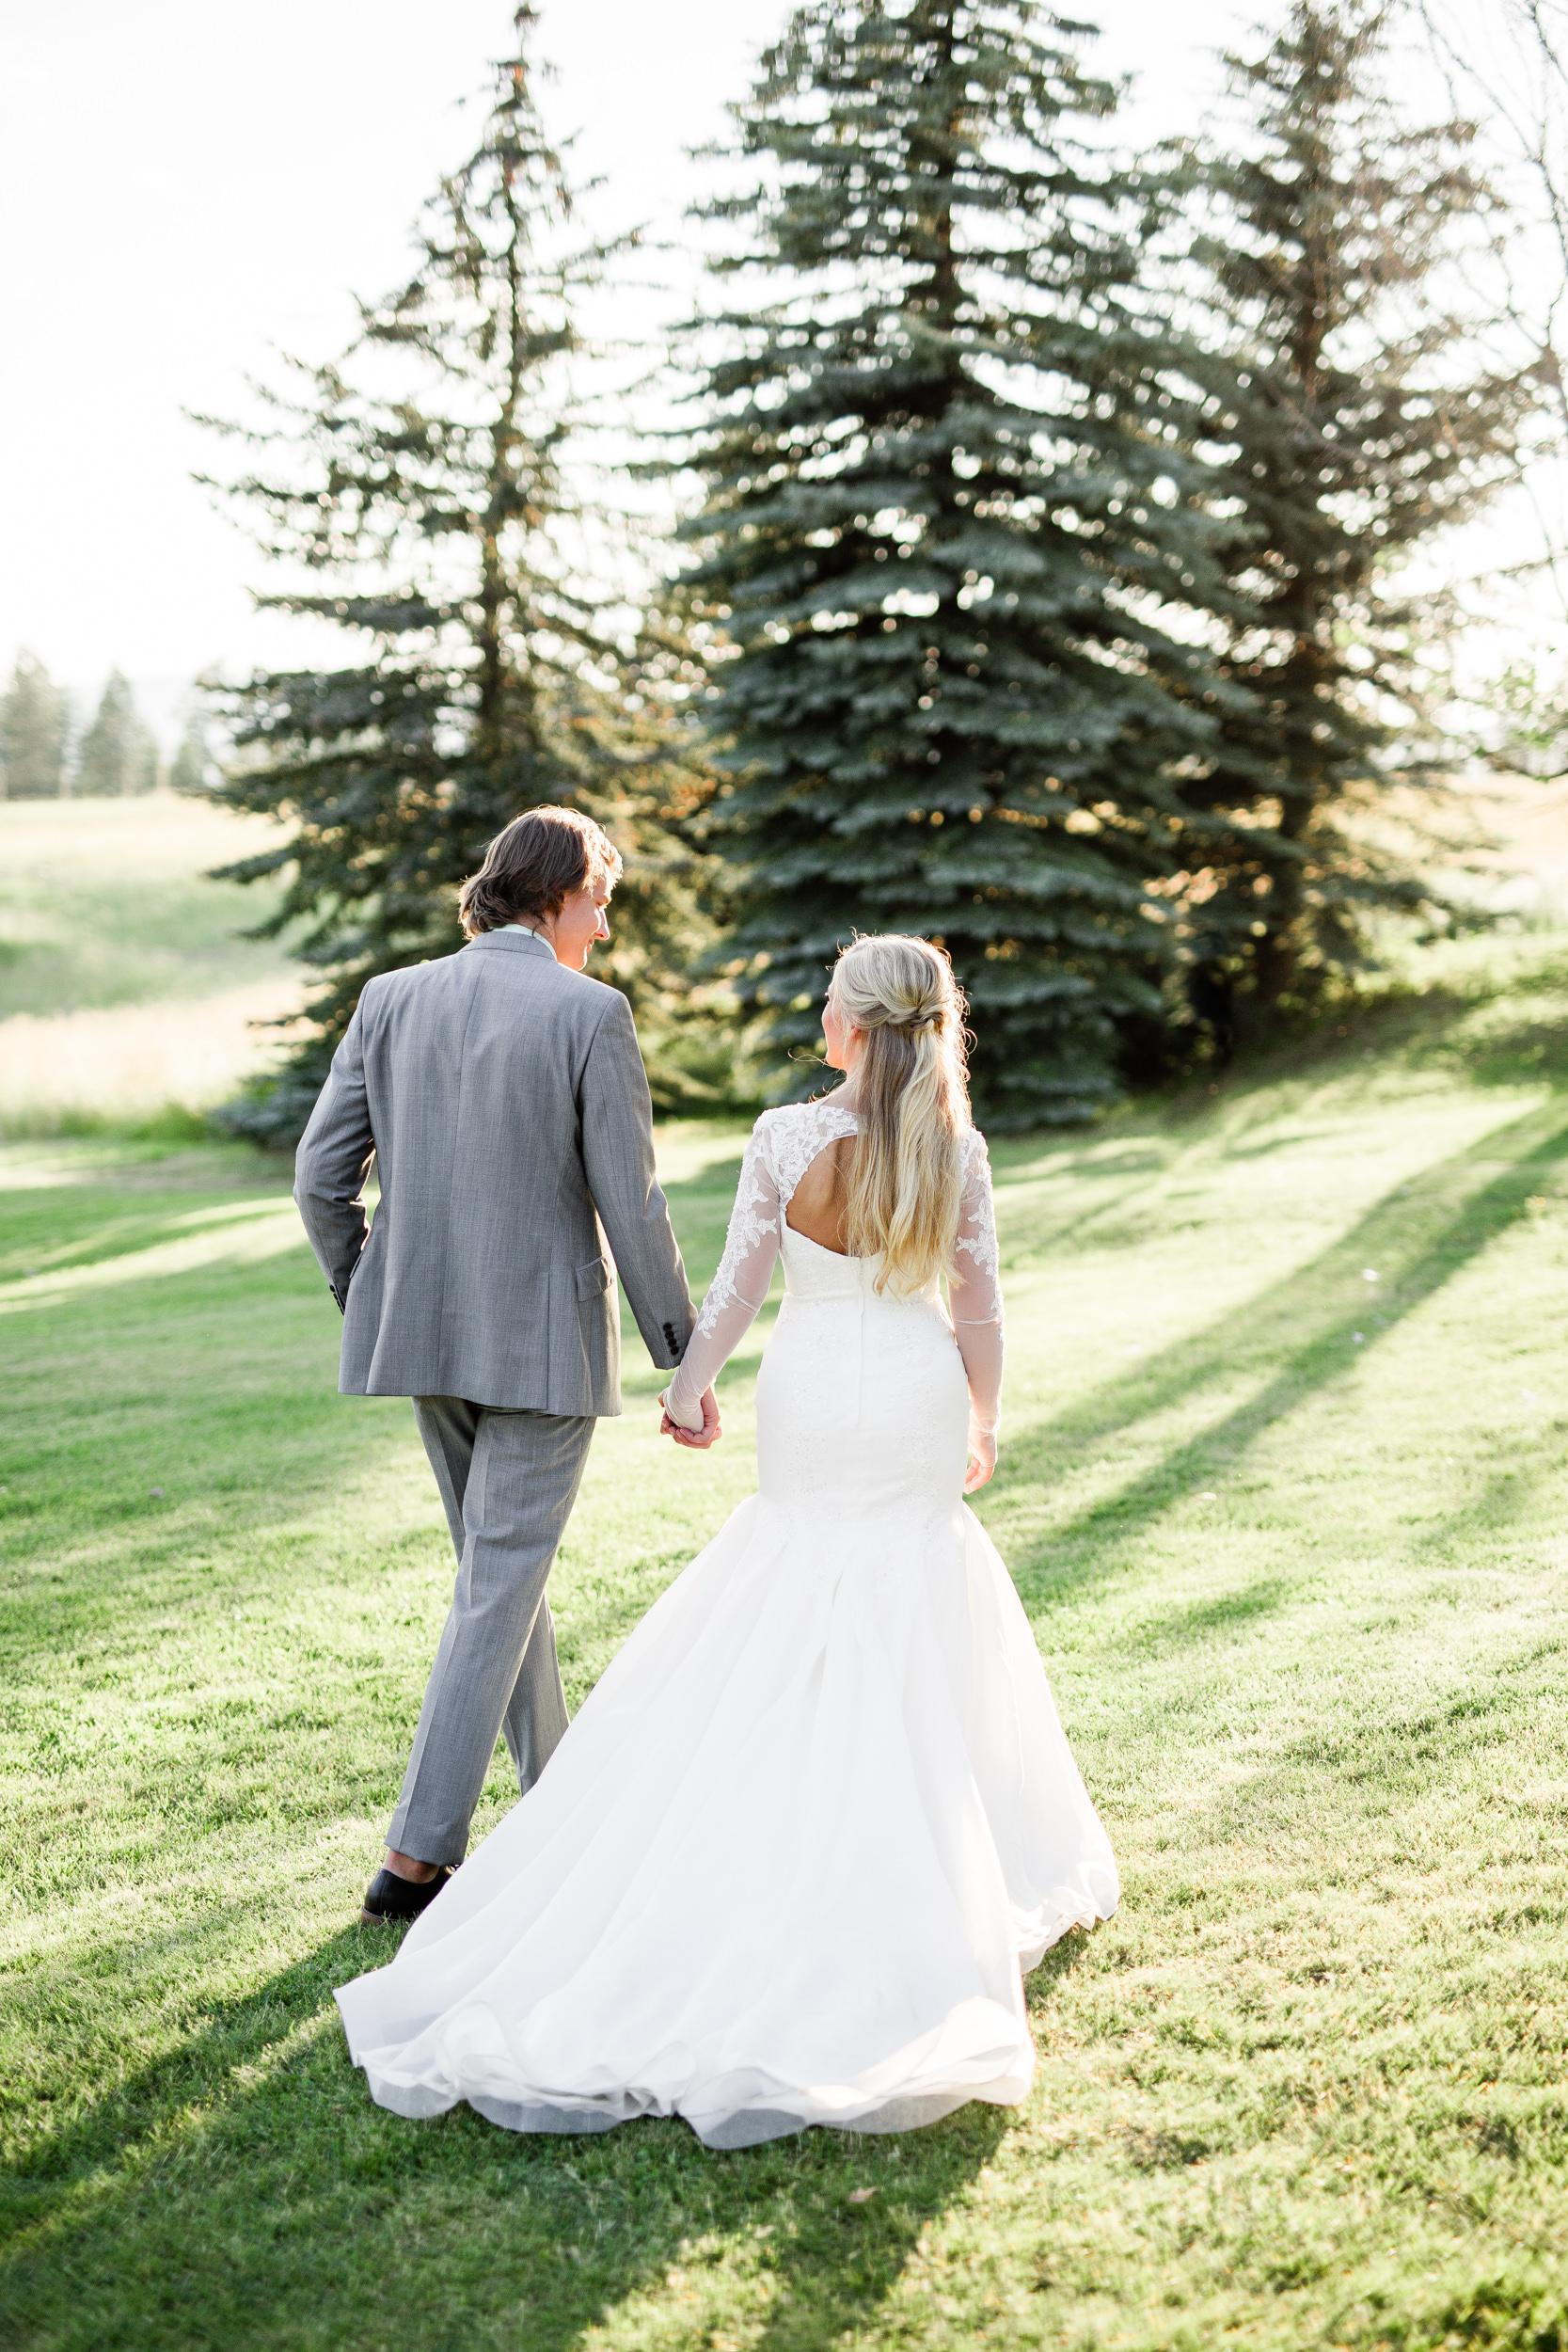 Maccoy dean Portland oregon fine art bright clean wedding engagement photographer Spokane Washington Green Bluff Wedding-1.jpg